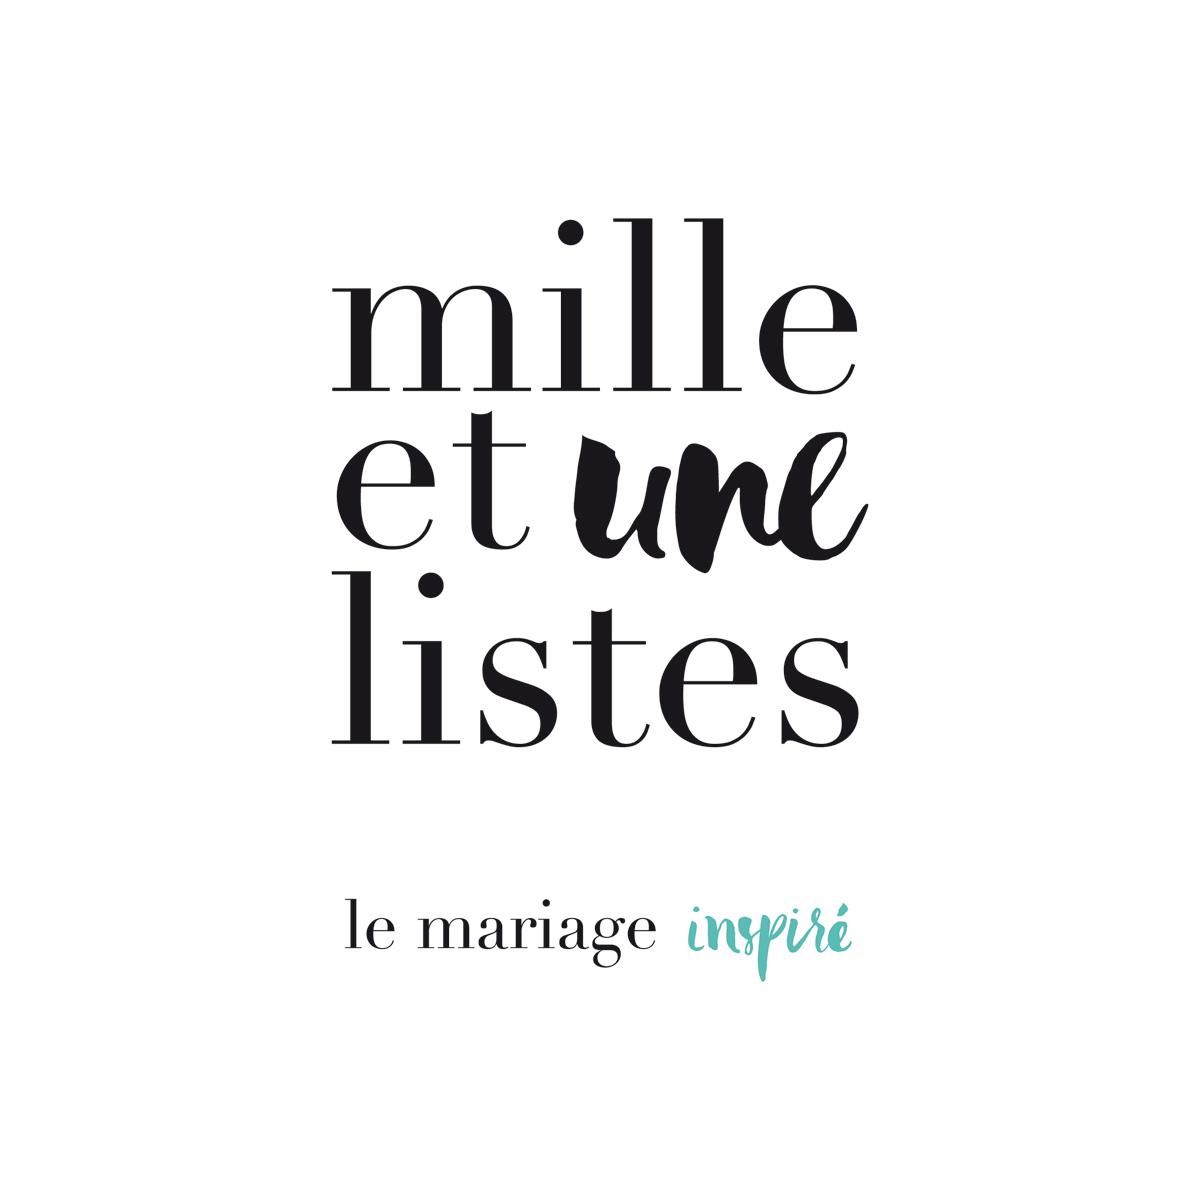 1001 liste mariage